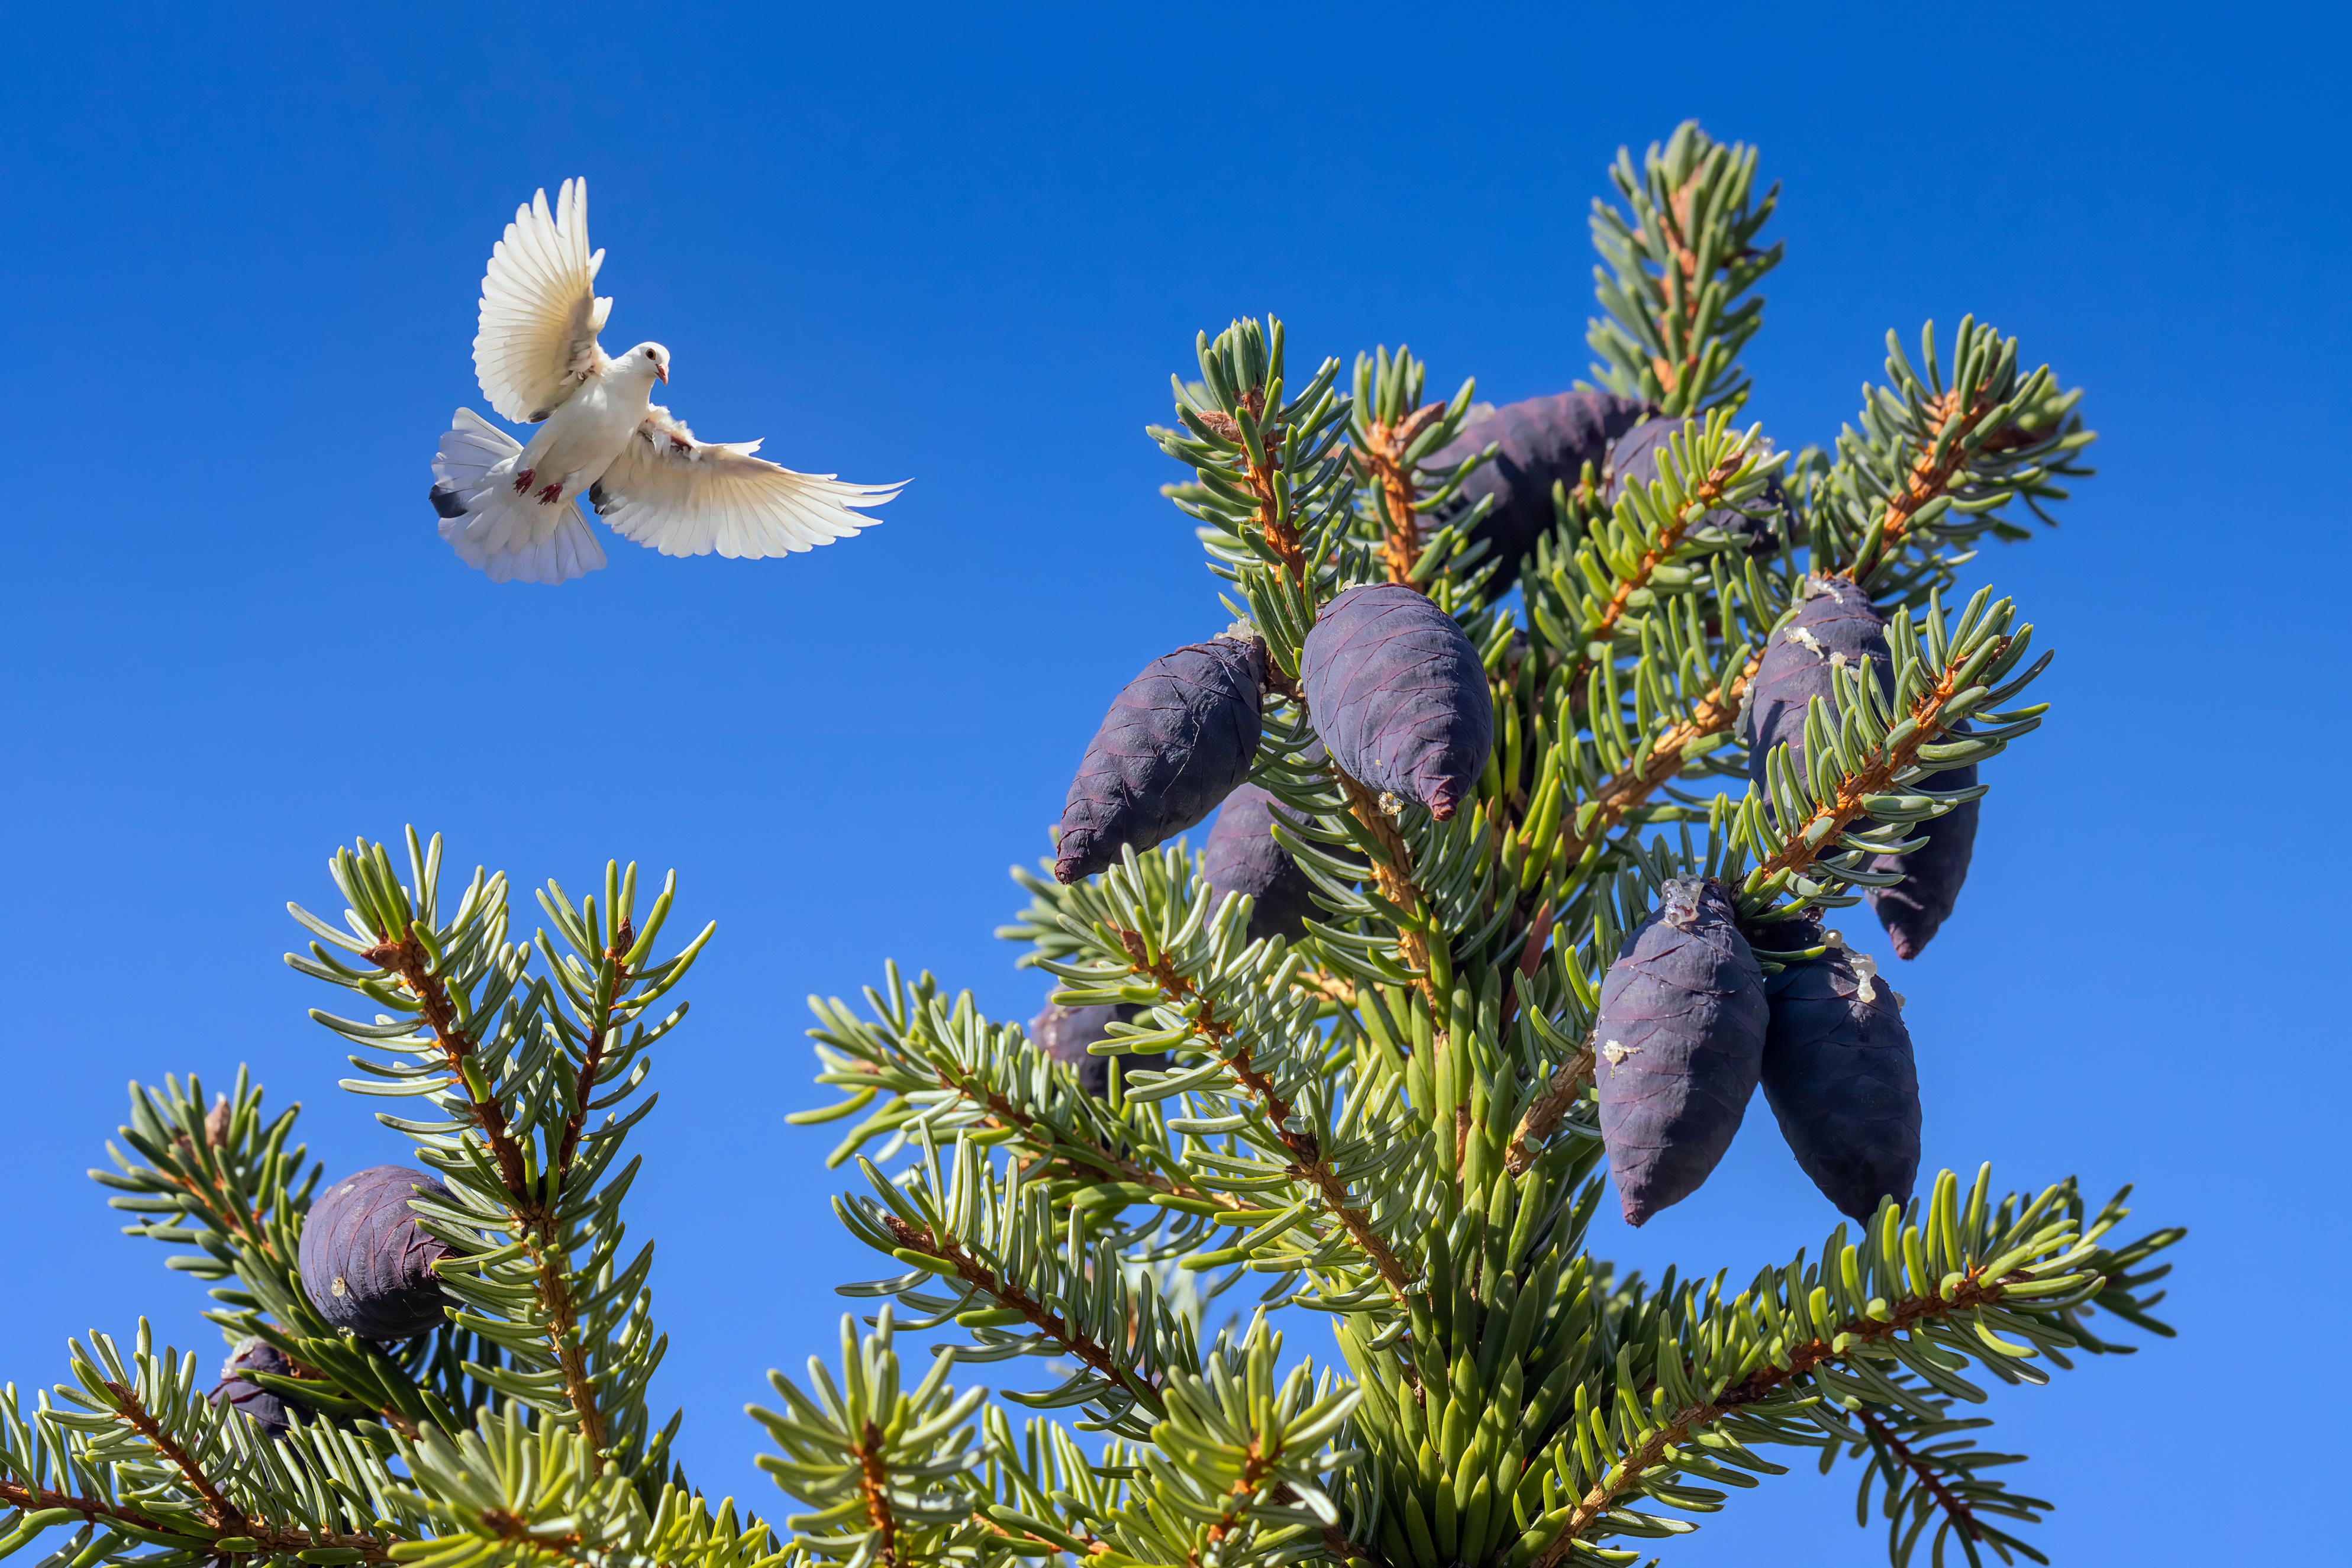 Desktop Wallpapers Birds pigeon Flight Branches Conifer cone animal bird Pigeons Pine cone Animals